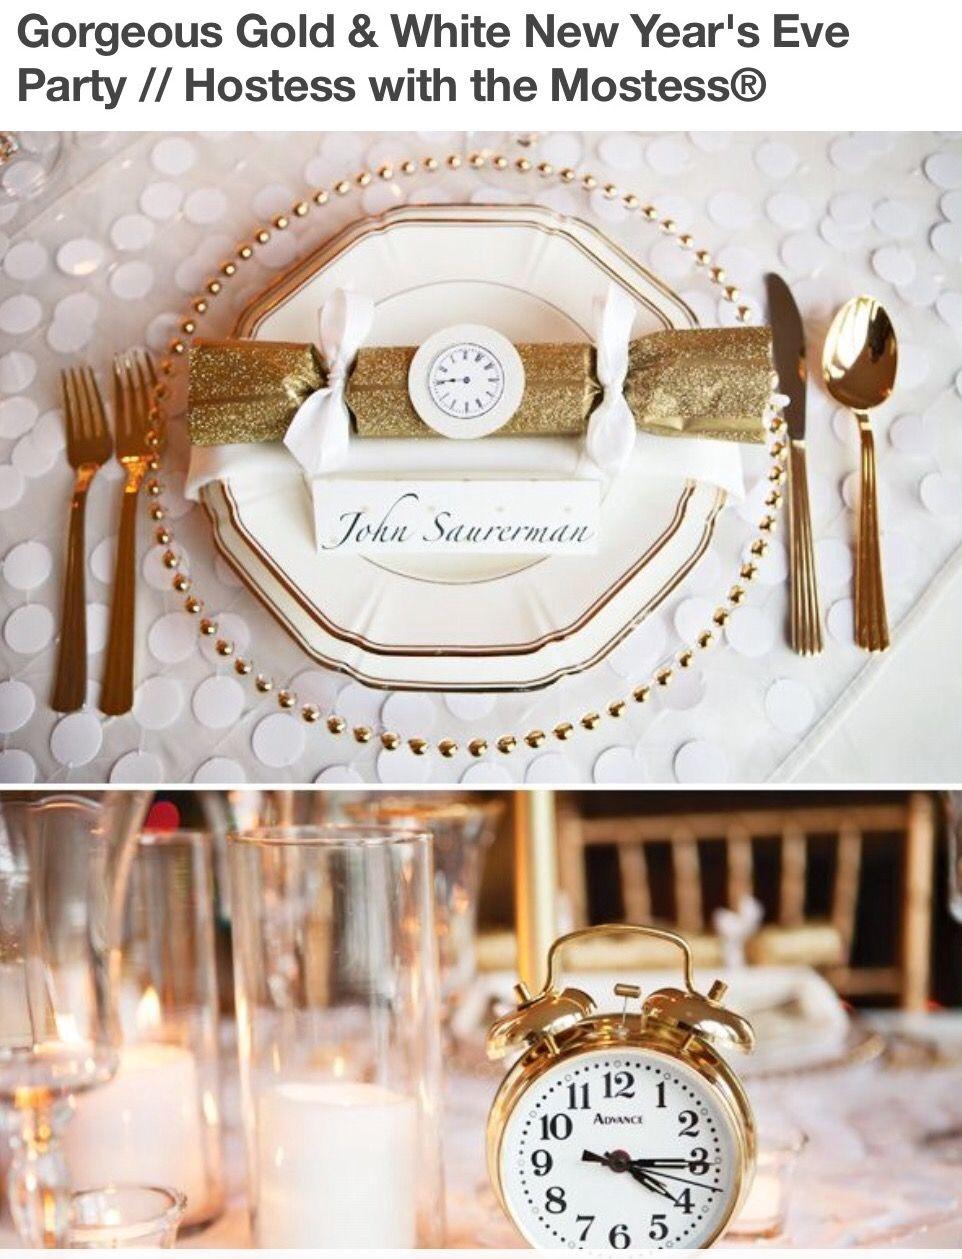 Pin by Debi Morgan on Wedding ideas | Pinterest | Party planning ...